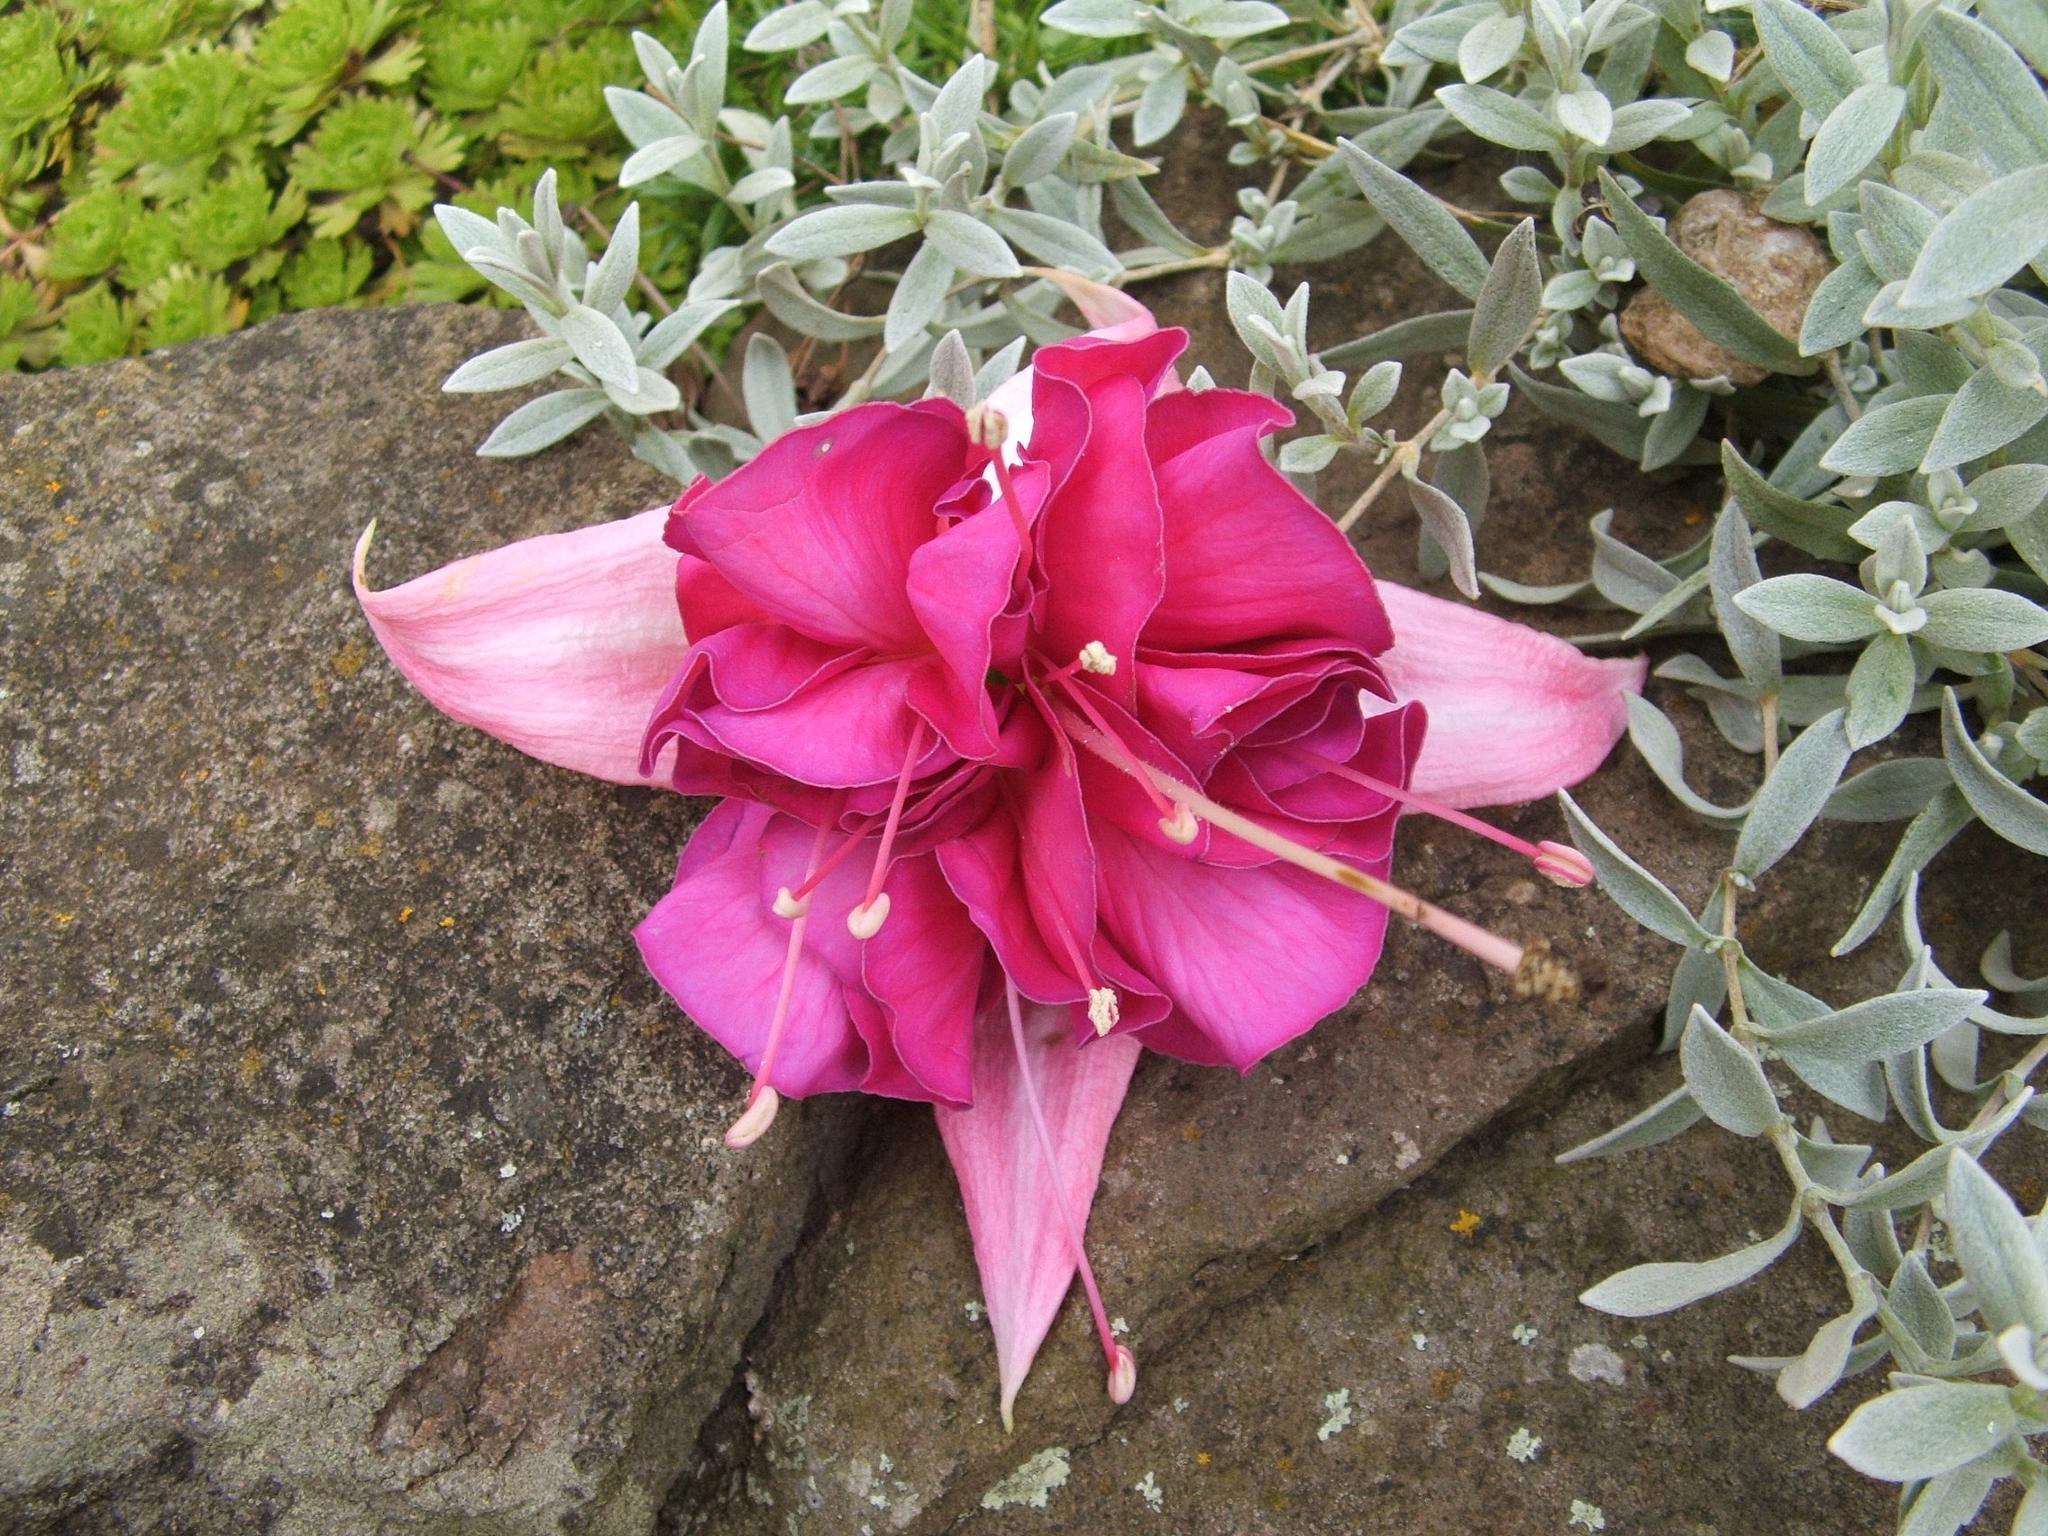 Flowers: Fuchsia's Elegant Folds by PirateKing